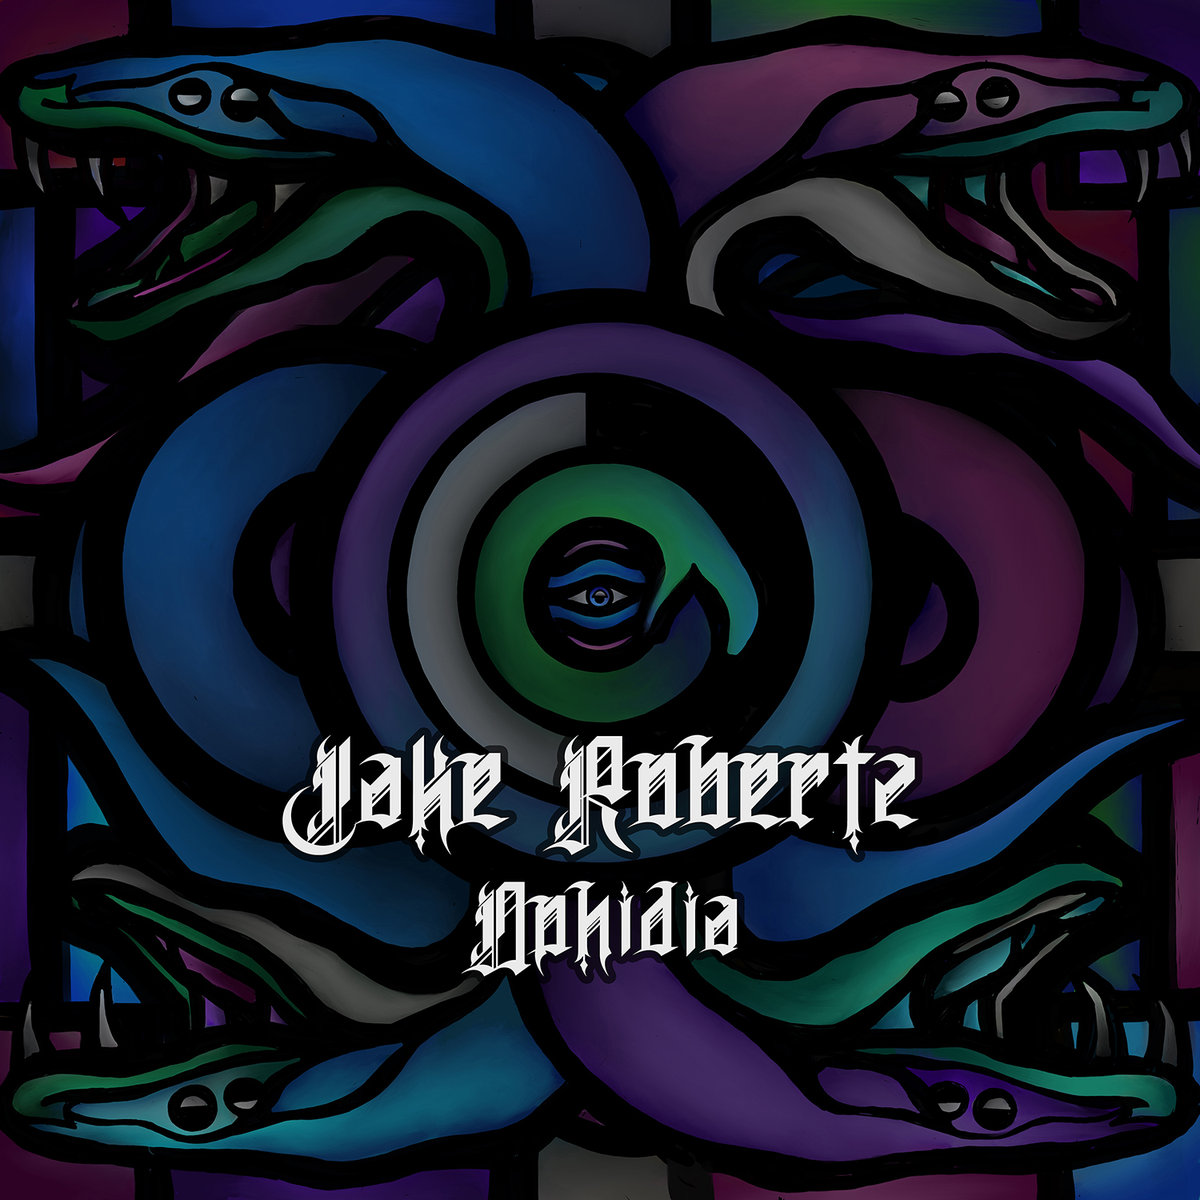 JakeRobertz-Ophidia